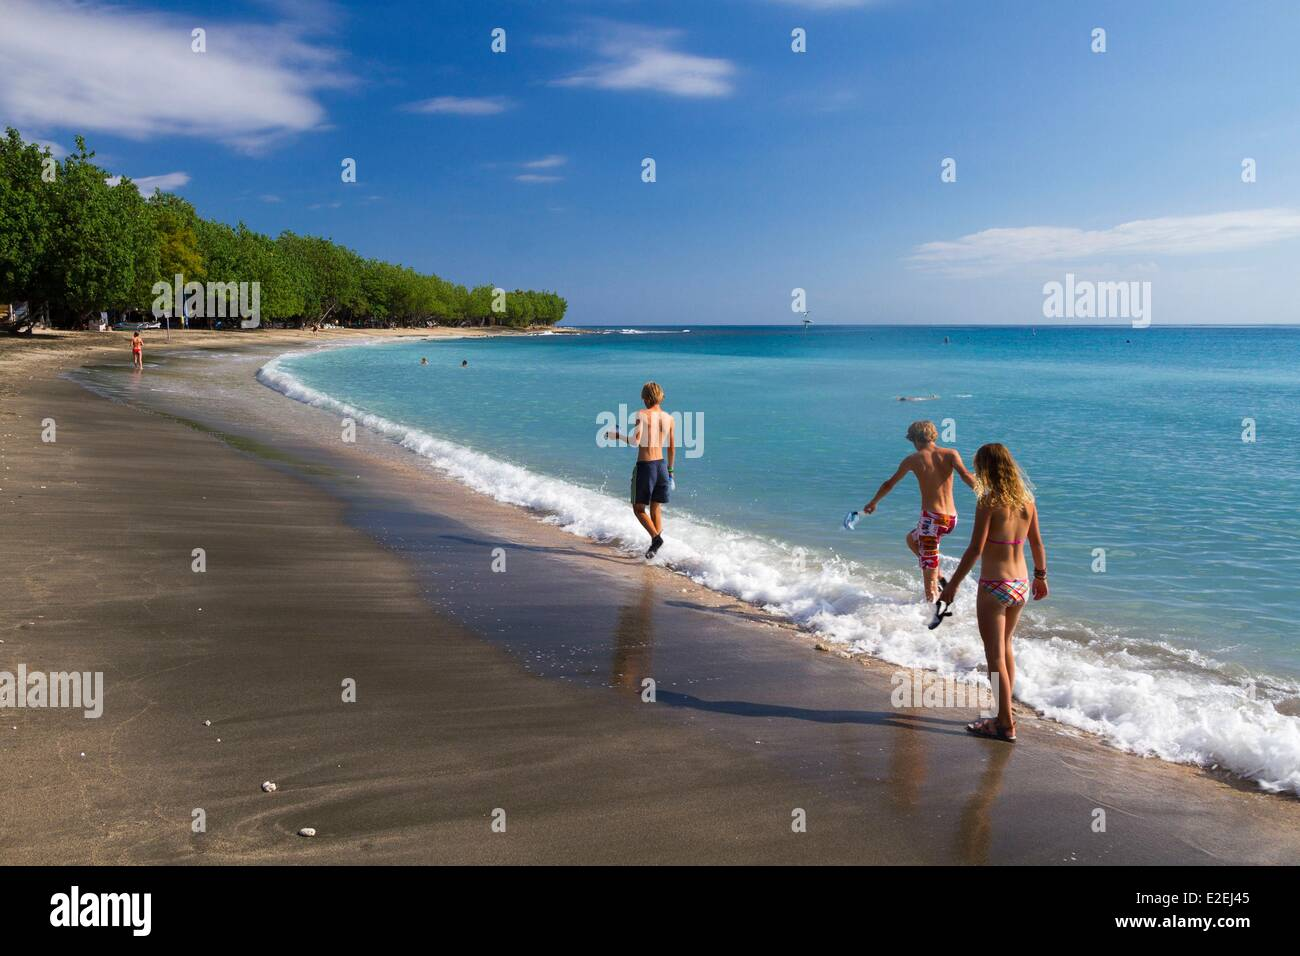 Indonesia, Bali, Pemuteran beach Stock Photo